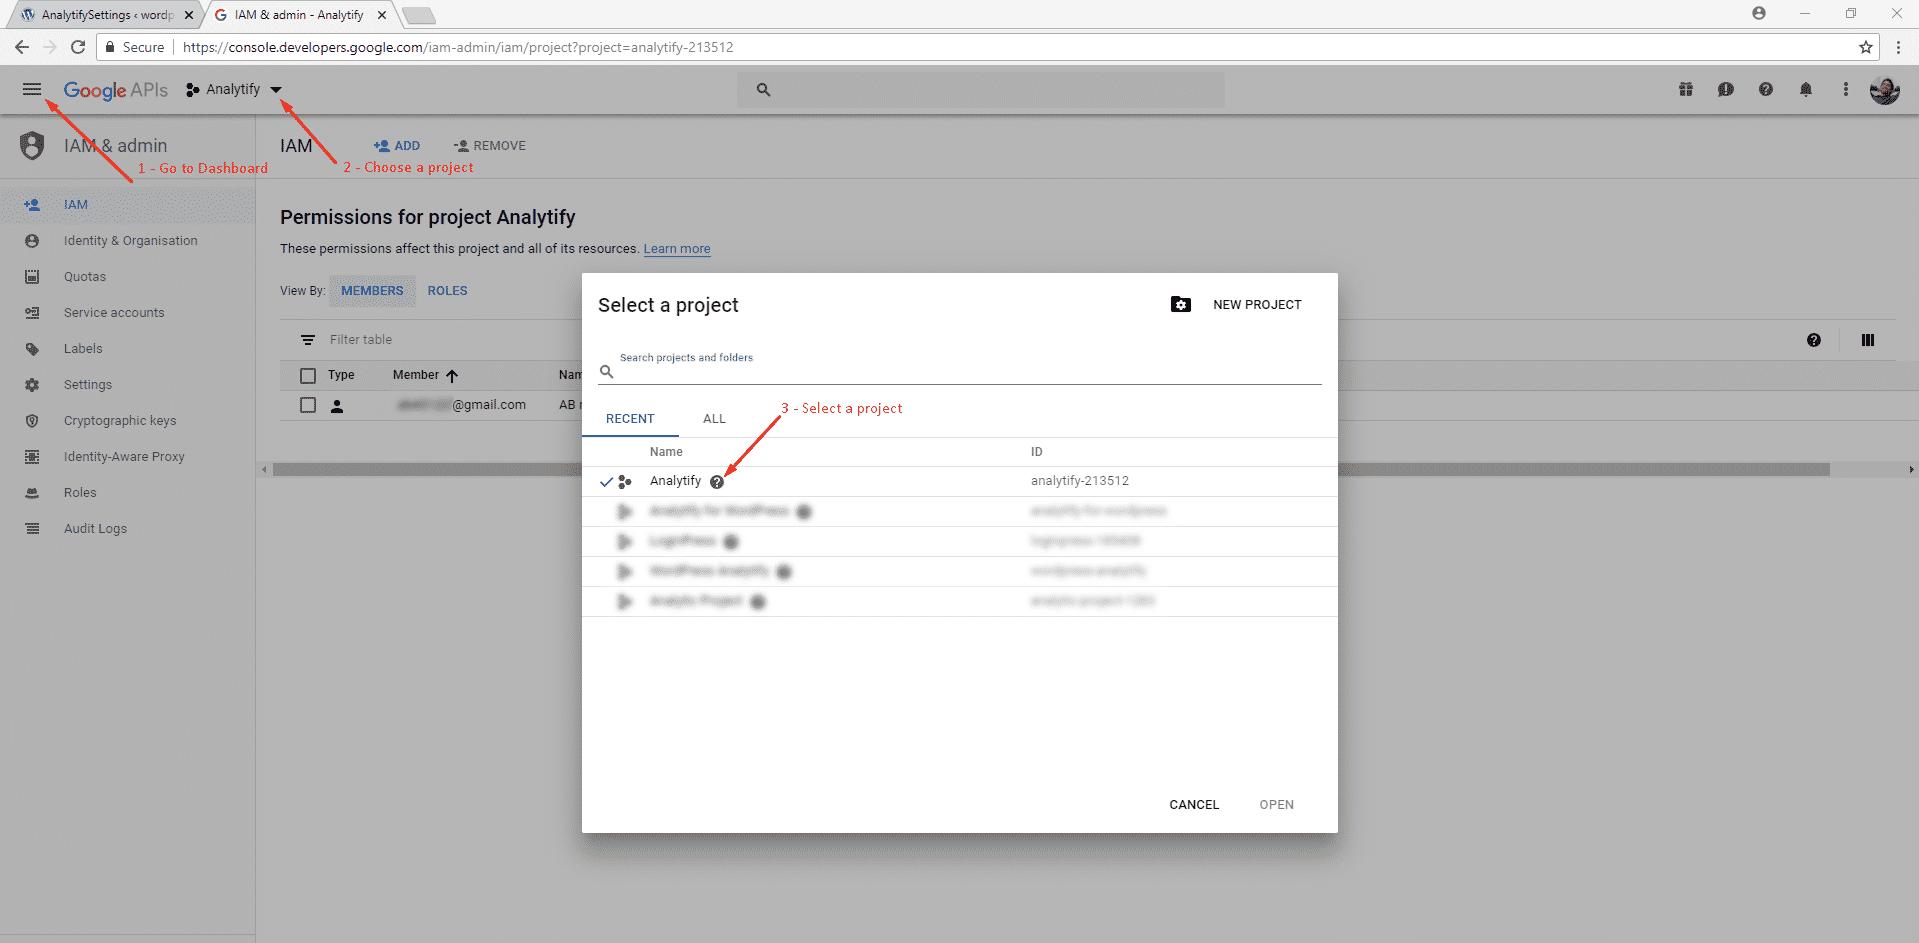 Get Client ID, Client Secret and Developer API Key for Google